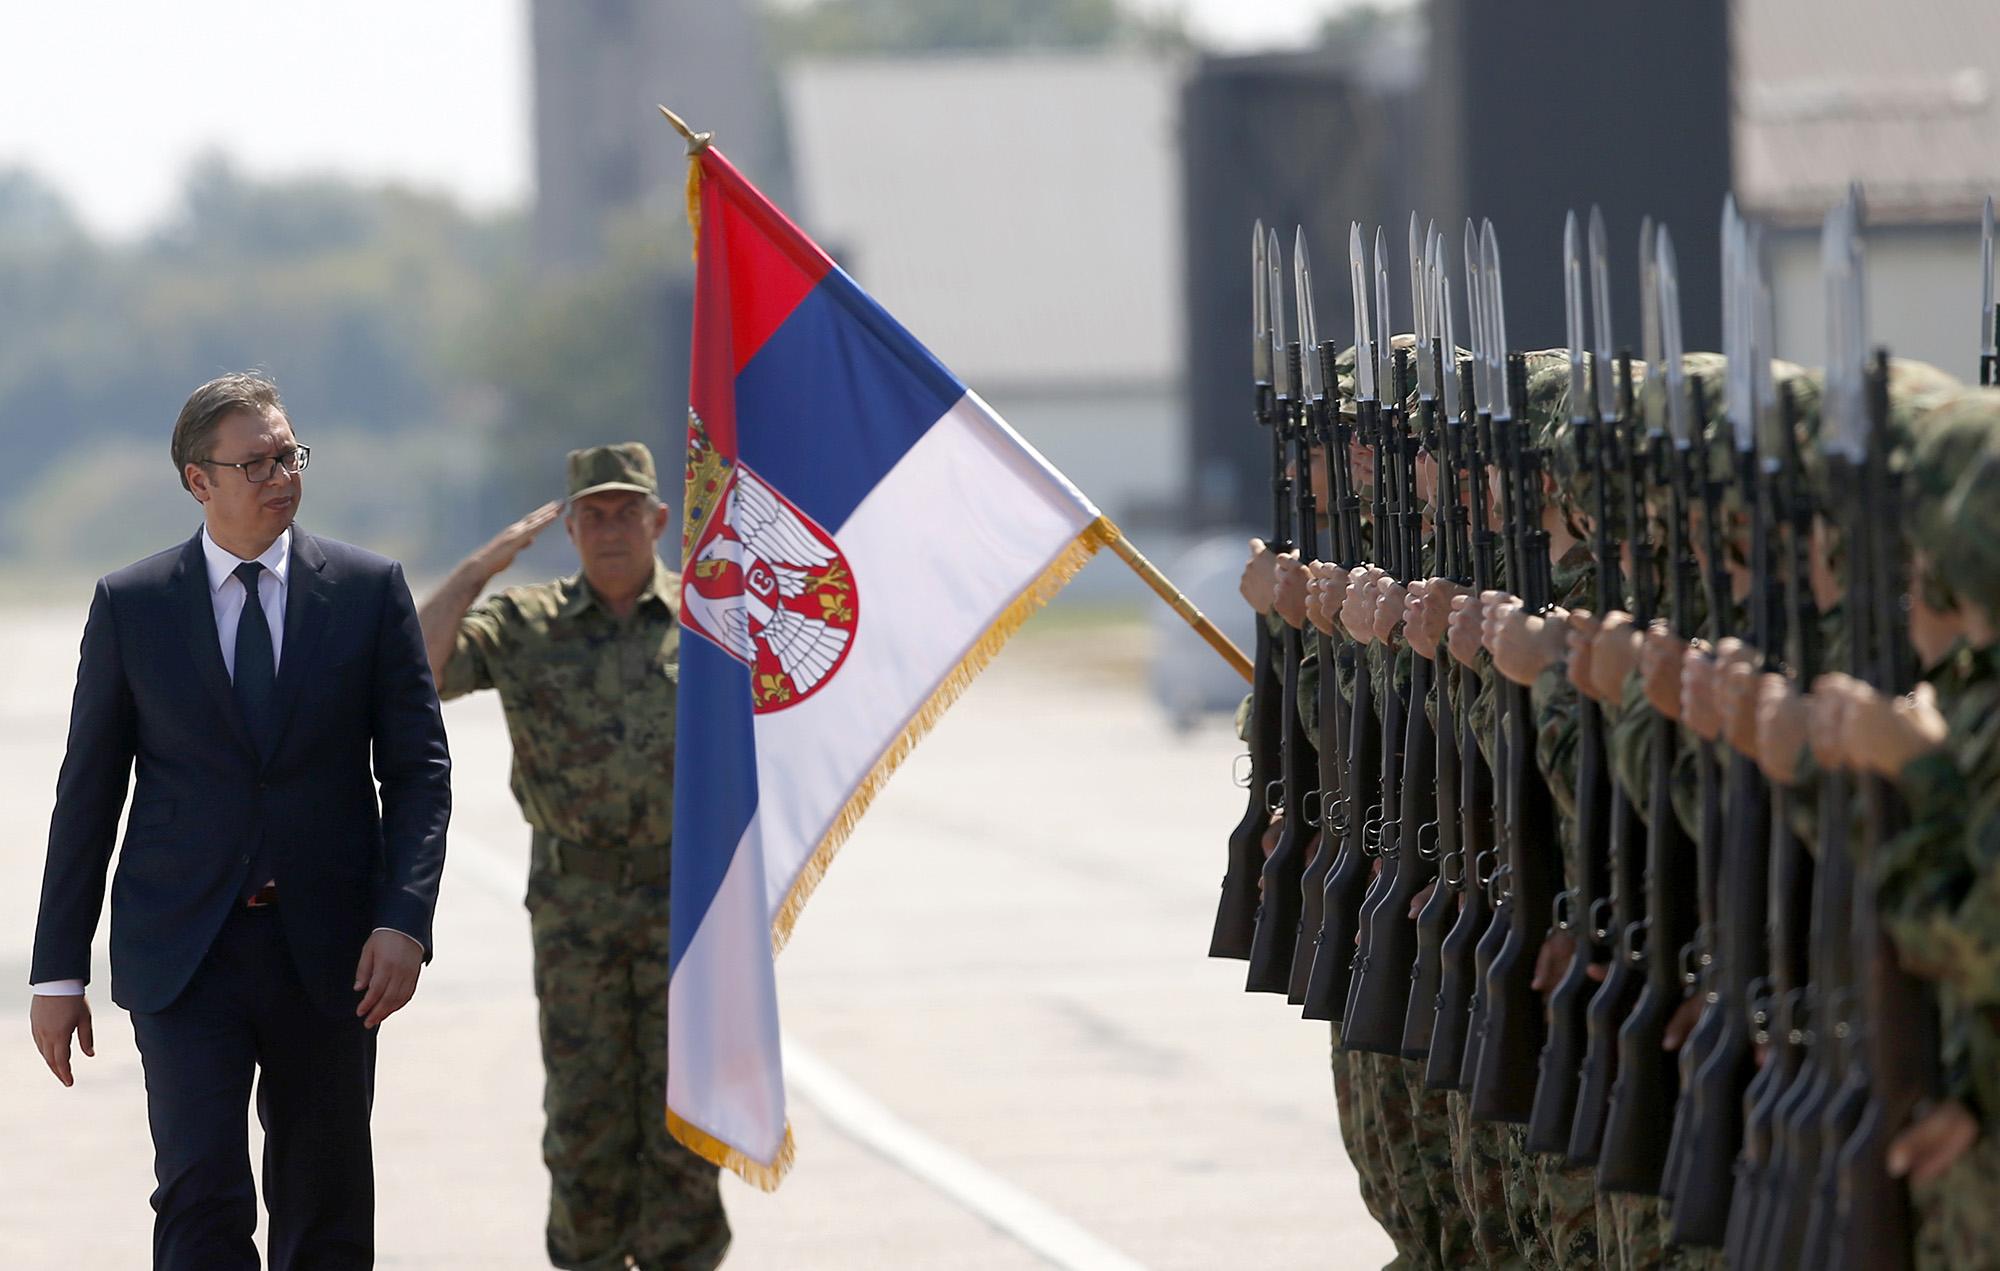 In this Aug. 21, 2018, file photo, Serbian President Aleksandar Vucic, left, reviews an honor guard on the tarmac at Batajnica, military airport near Belgrade, Serbia. (Darko Vojinovic/AP)